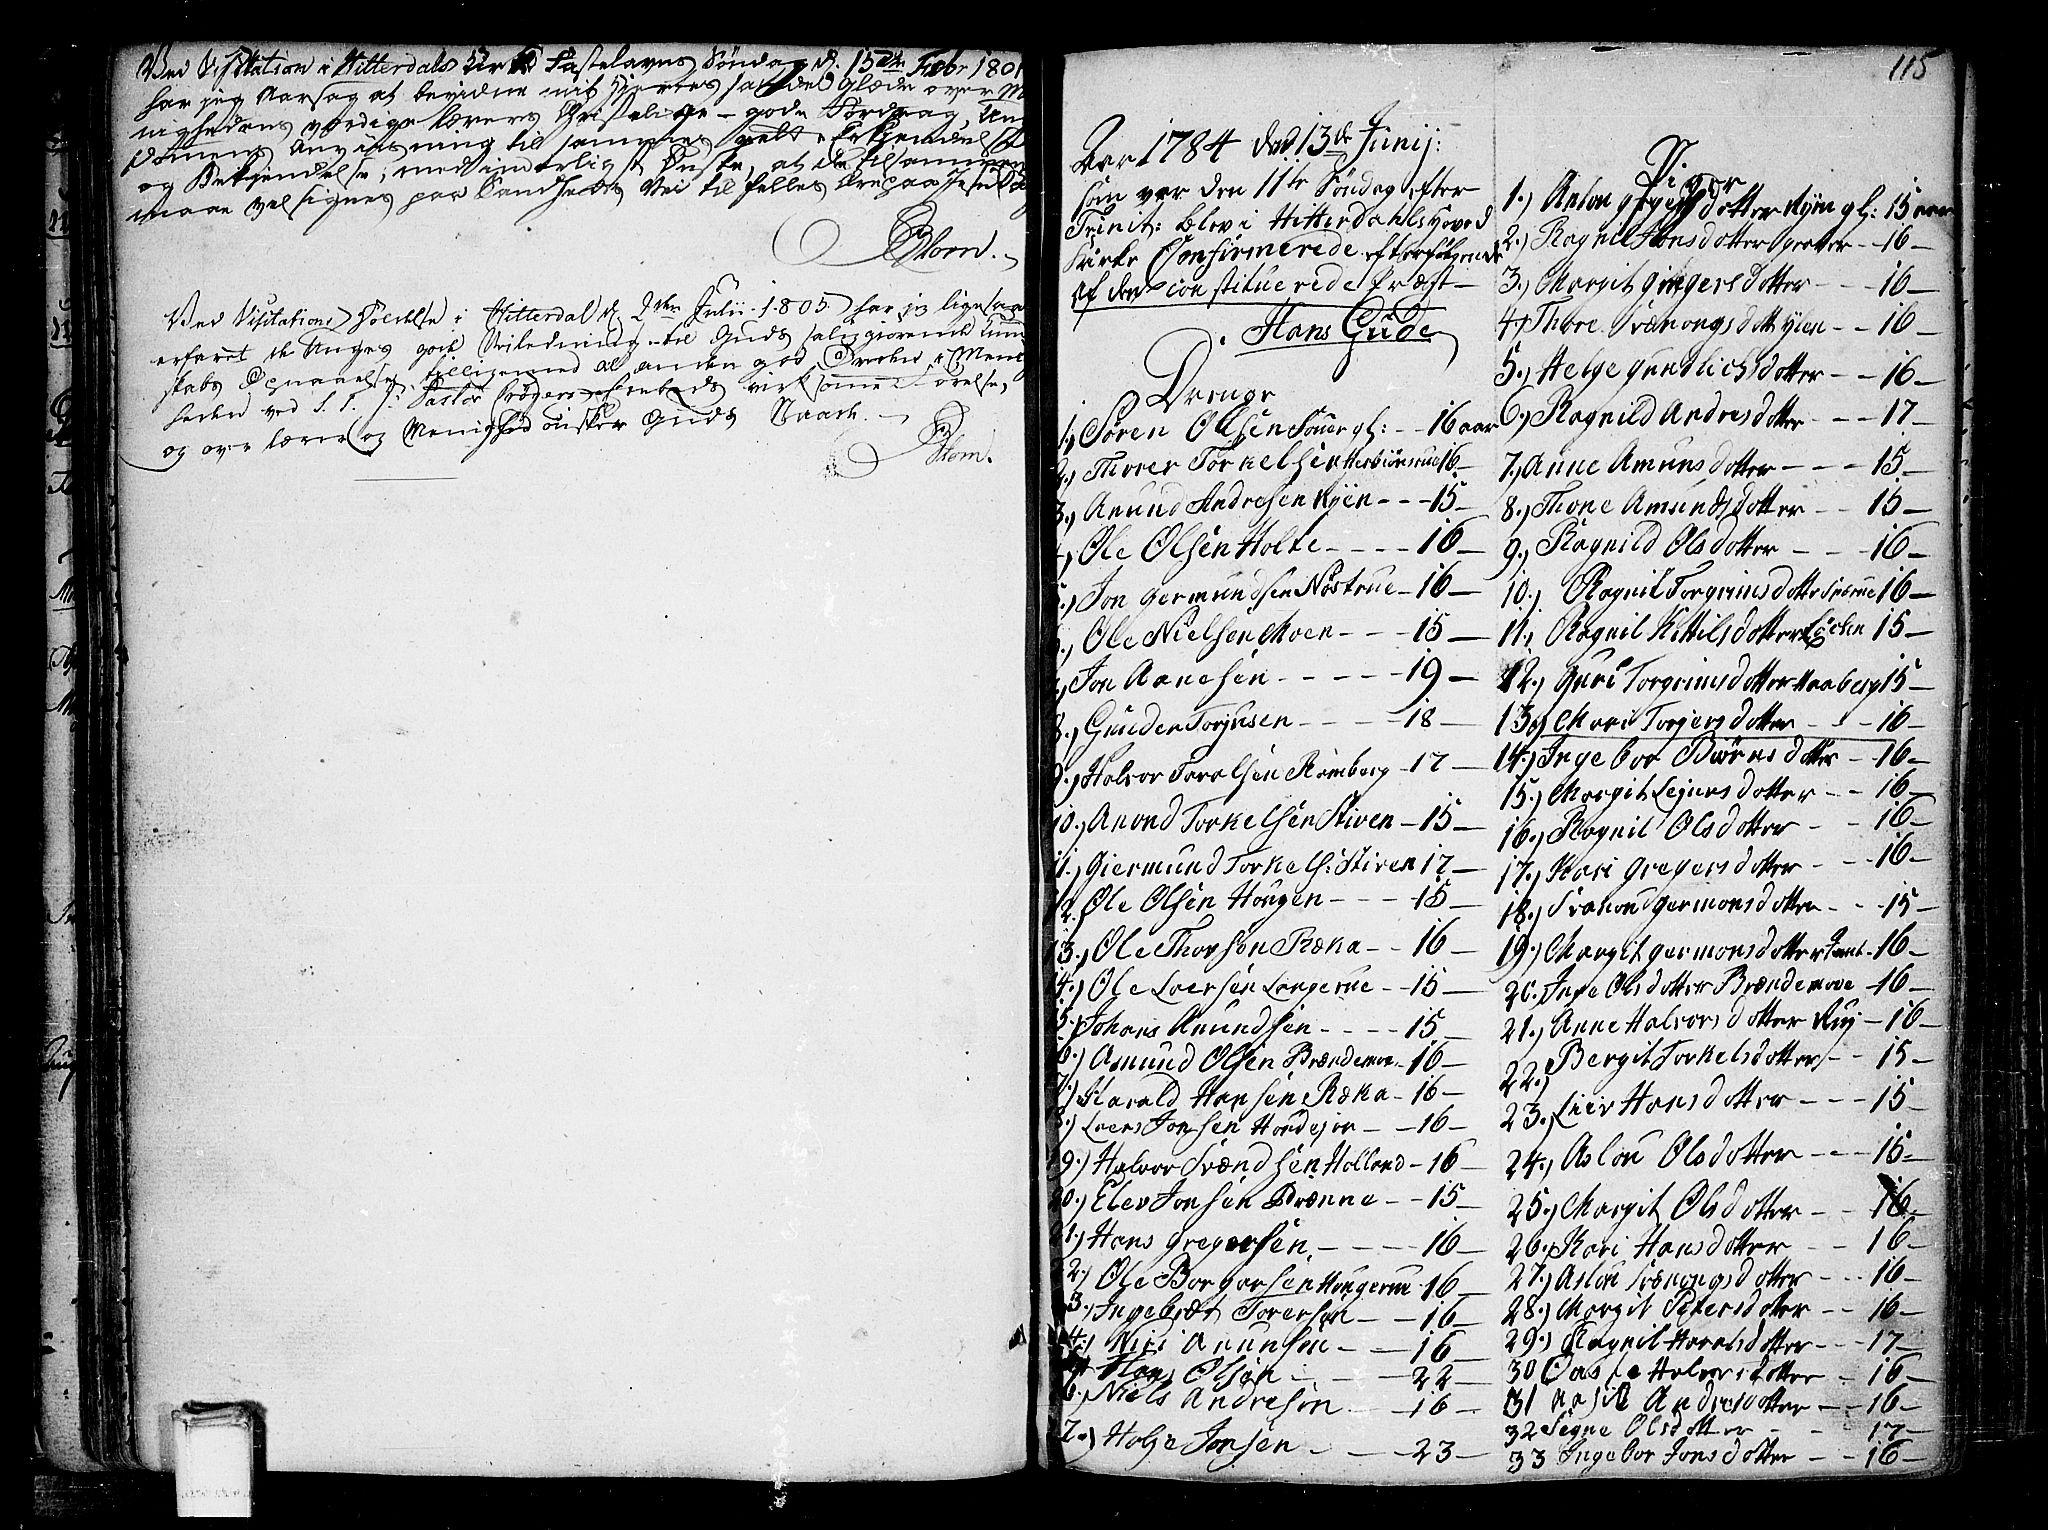 SAKO, Heddal kirkebøker, F/Fa/L0004: Parish register (official) no. I 4, 1784-1814, p. 115